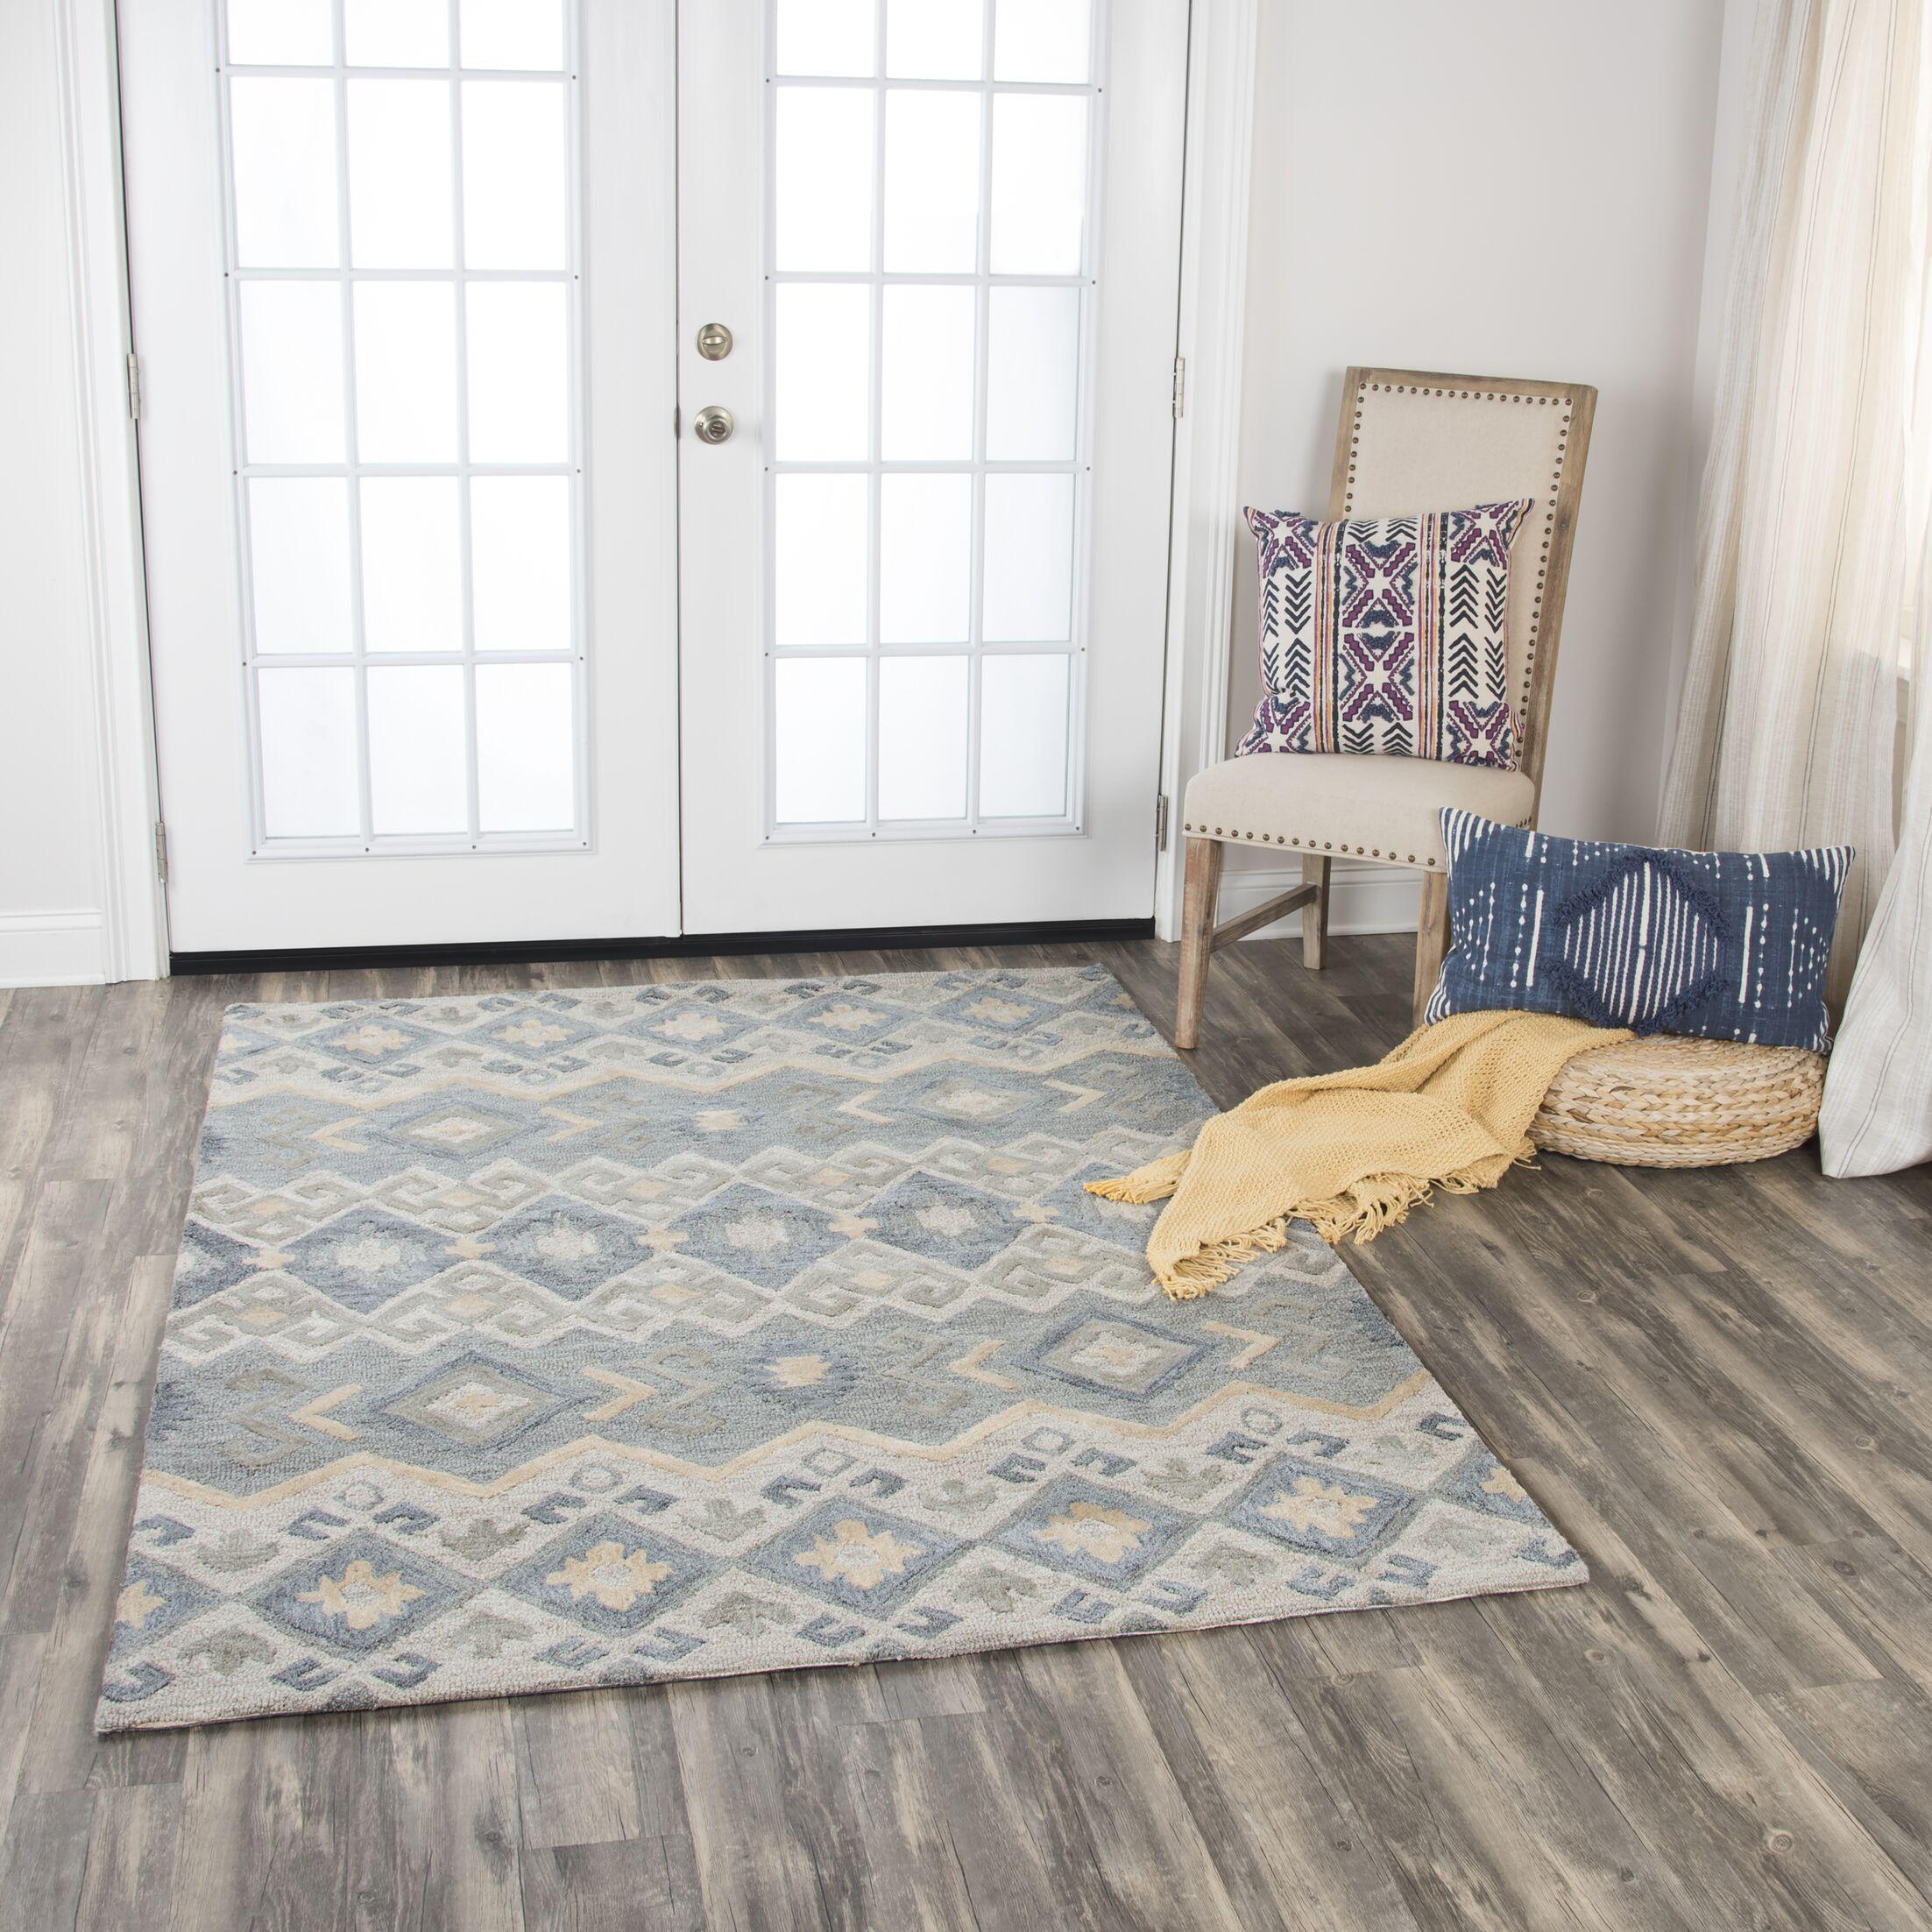 Pittard Geometric Hand-Tufted Wool Gray Area Rug Rug Size: 8' x 10'